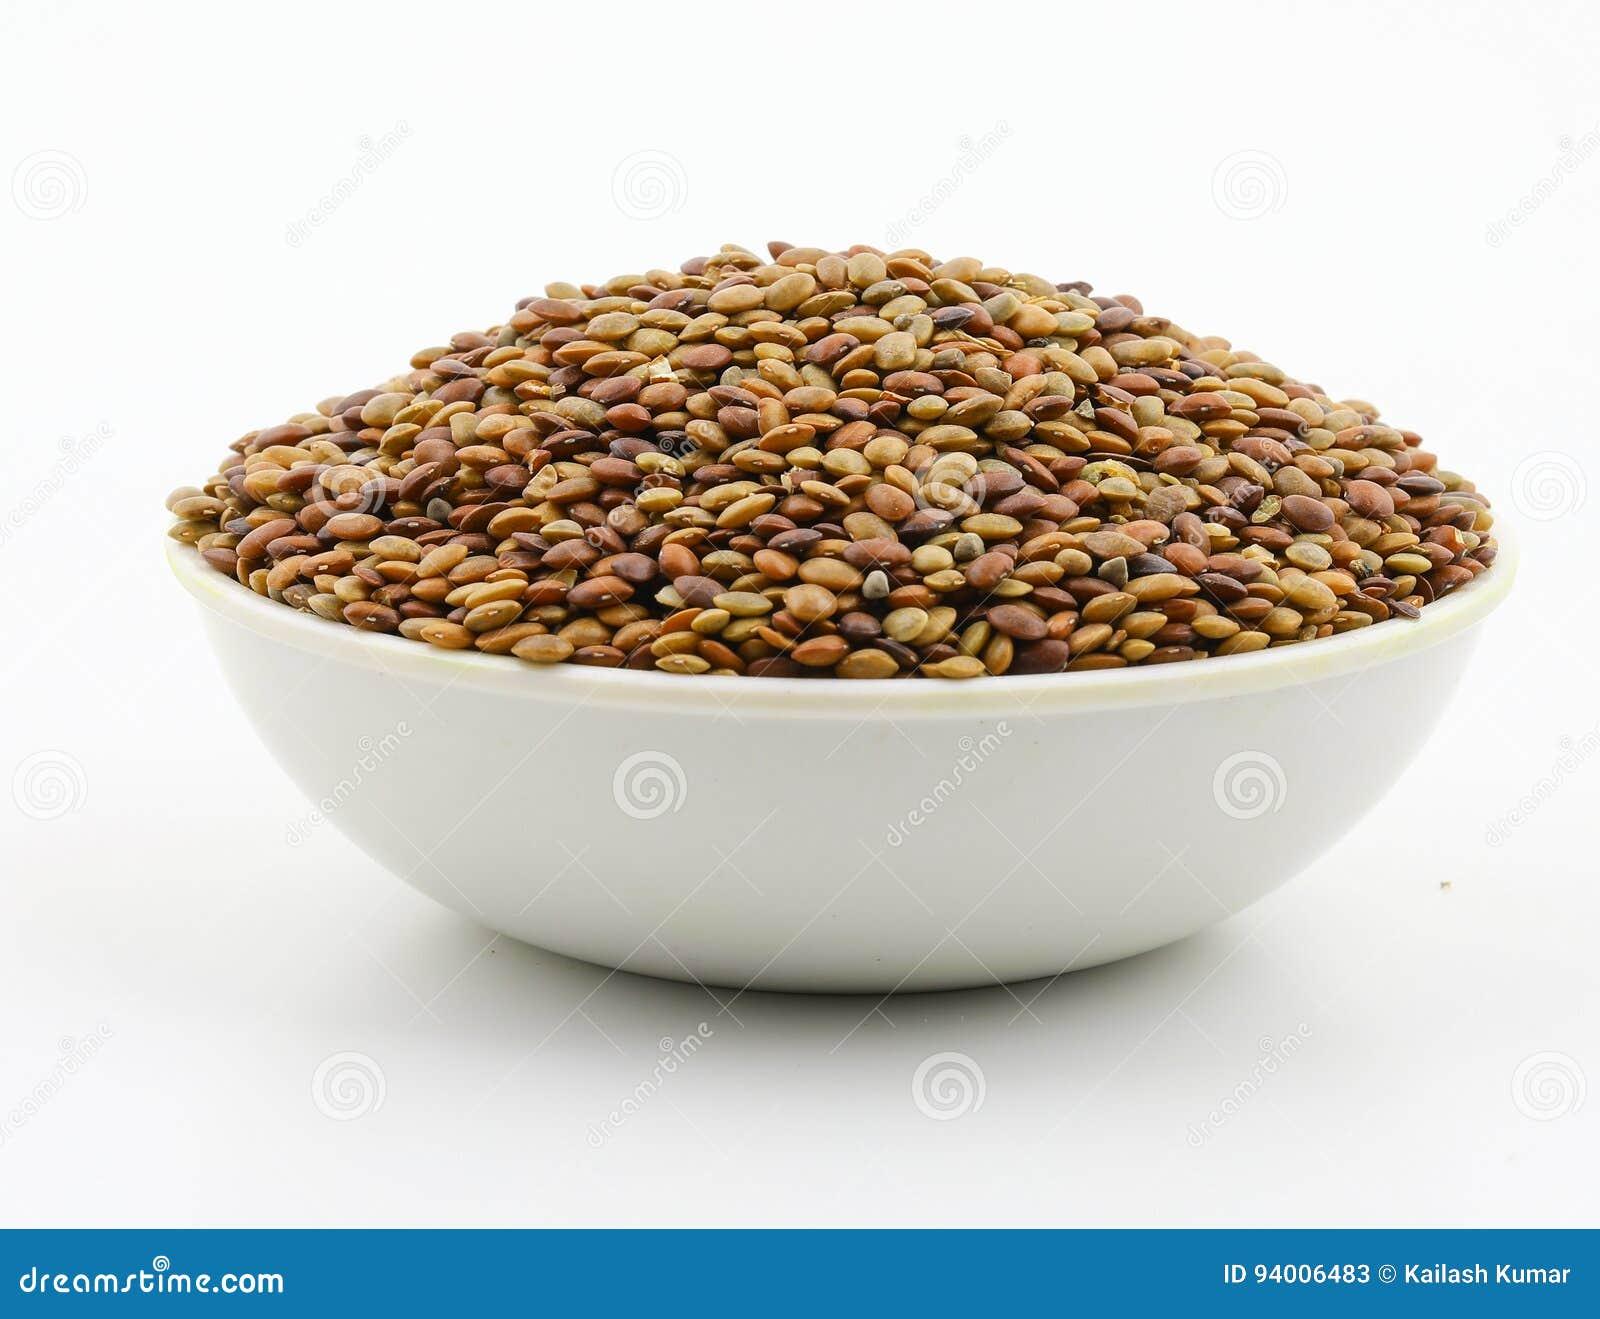 Karat seeds stock image  Image of organic, delicious - 94006483